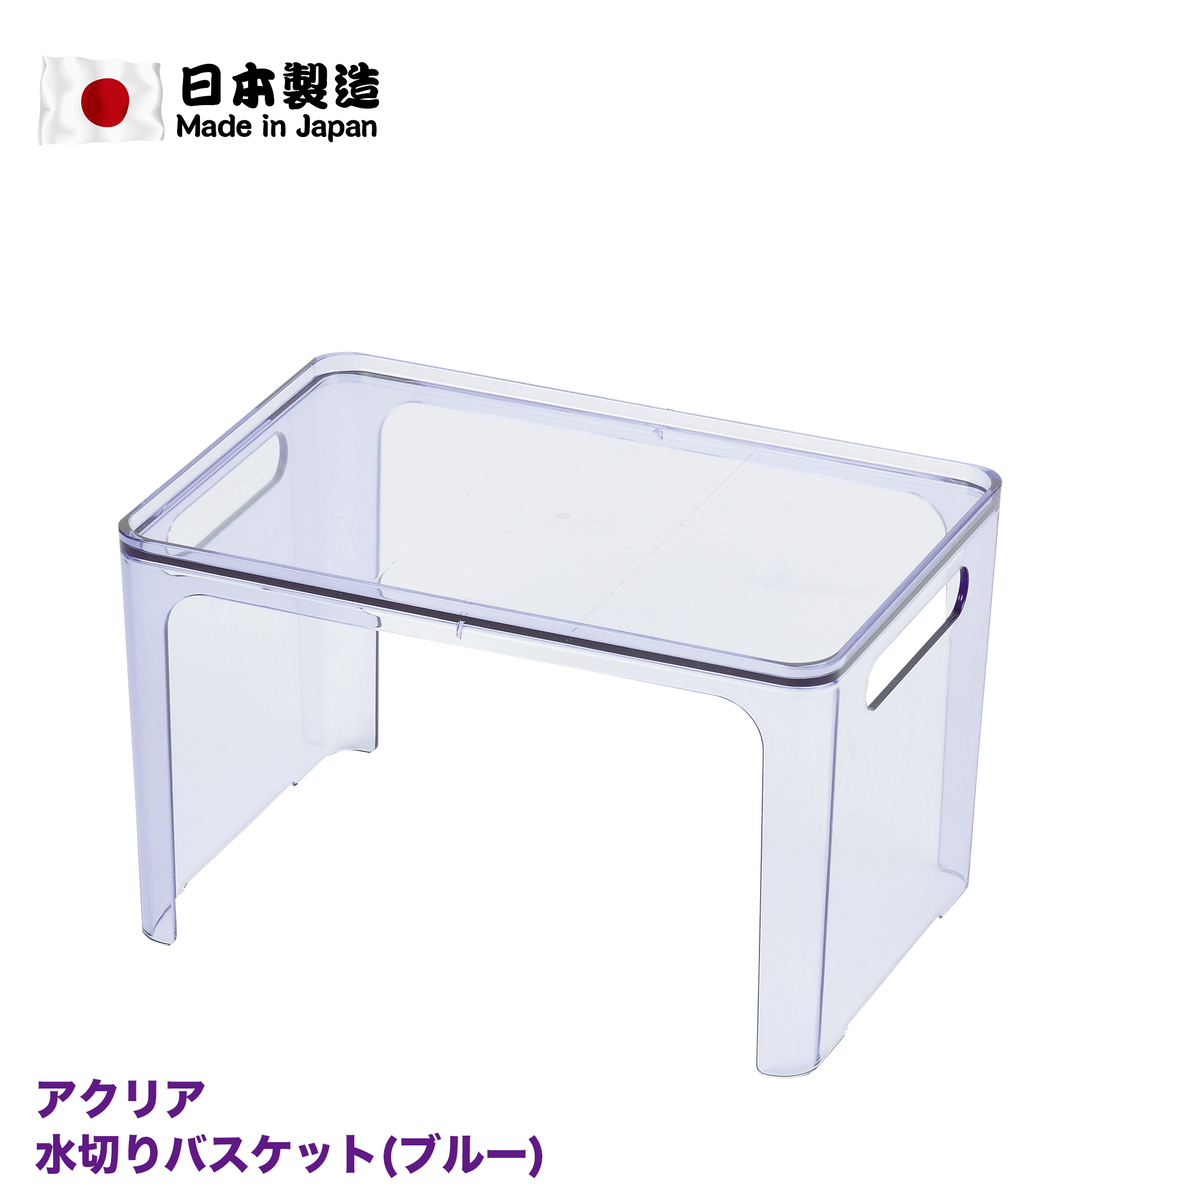 HB-3522 Kitchen shelf - Blue